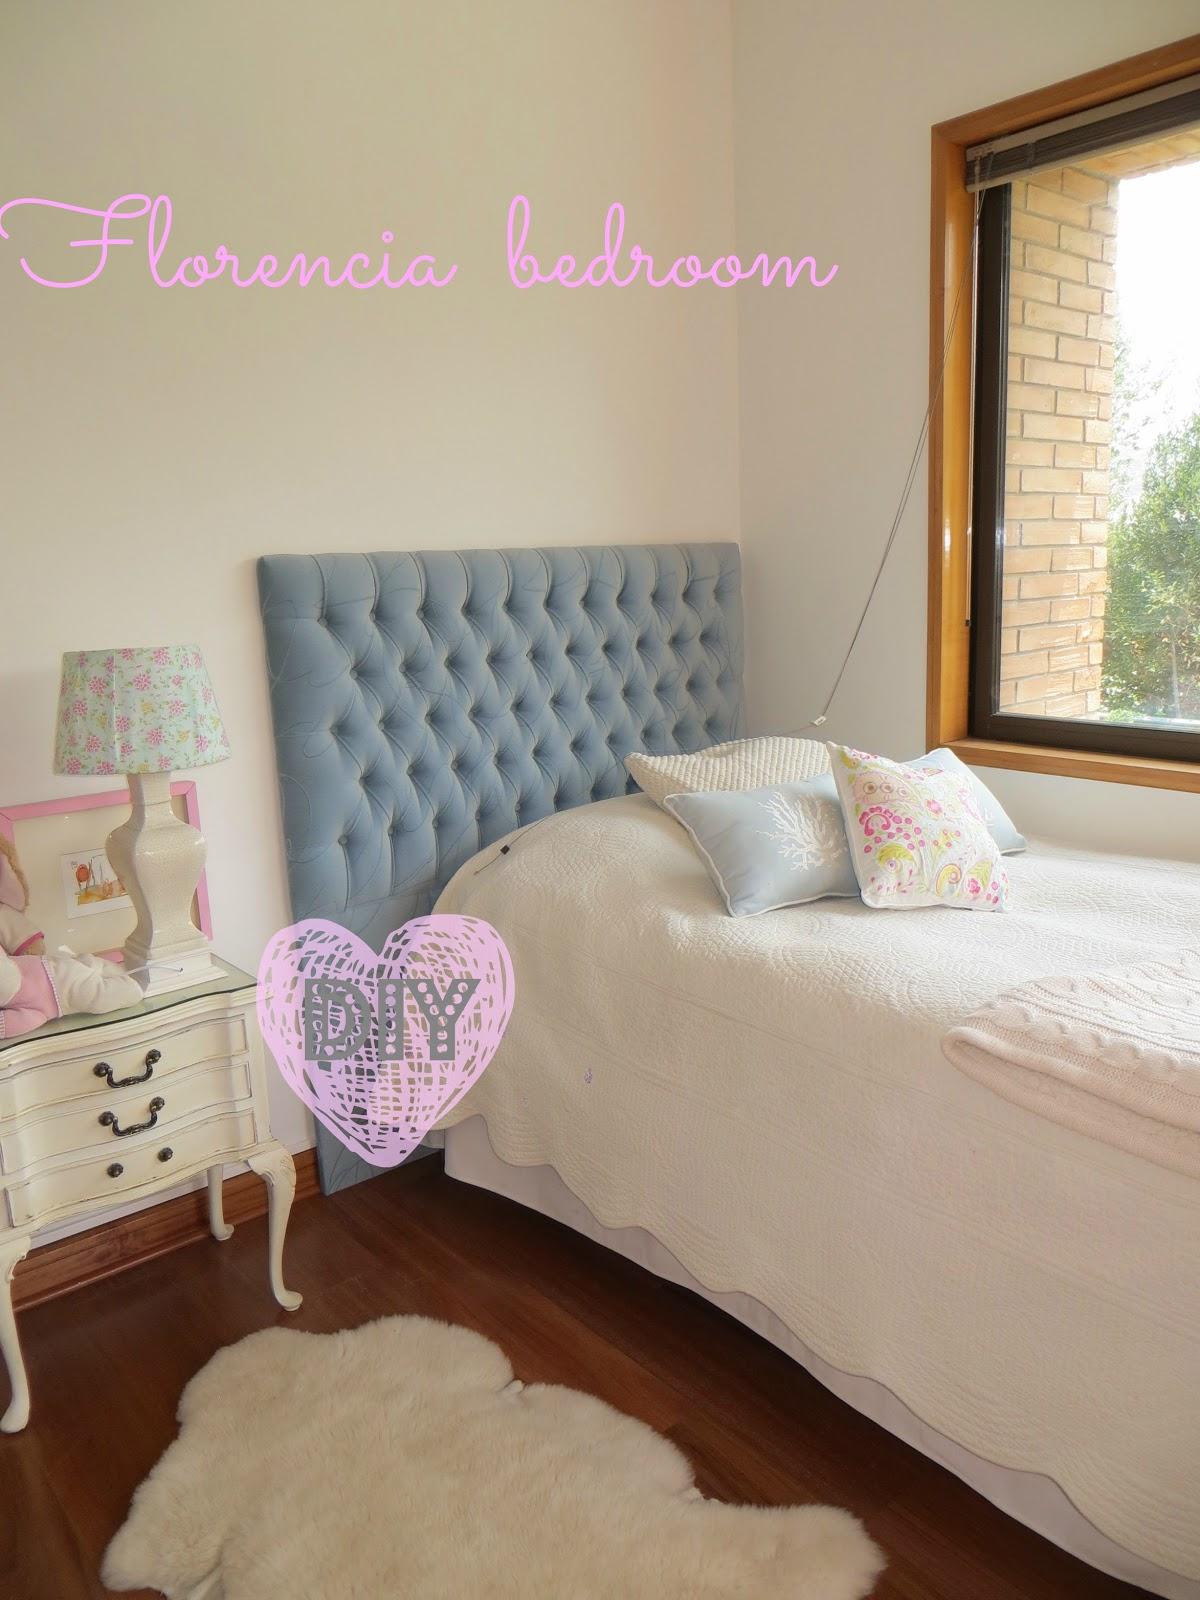 Decora y adora diy respaldo tapizado cama diy upholstered - Cabezal de cama tapizado ...